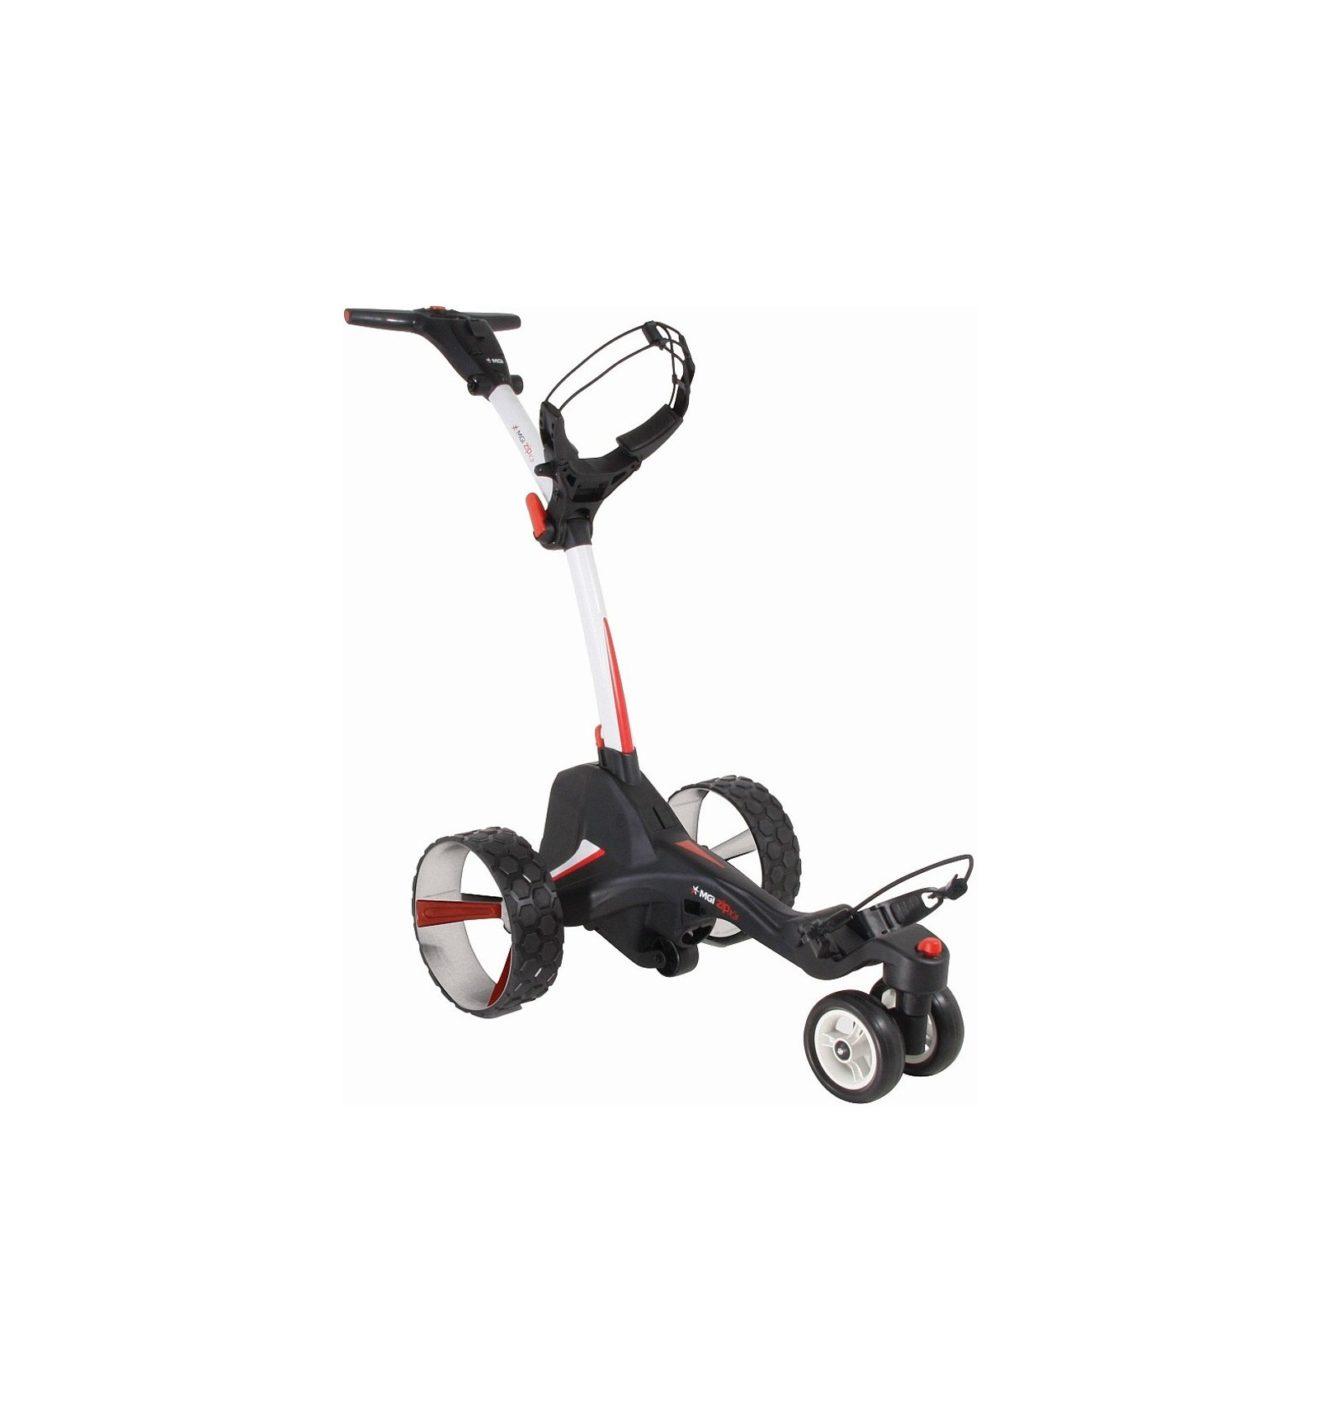 mgi-chariot-electrique-zip-x3-blanc